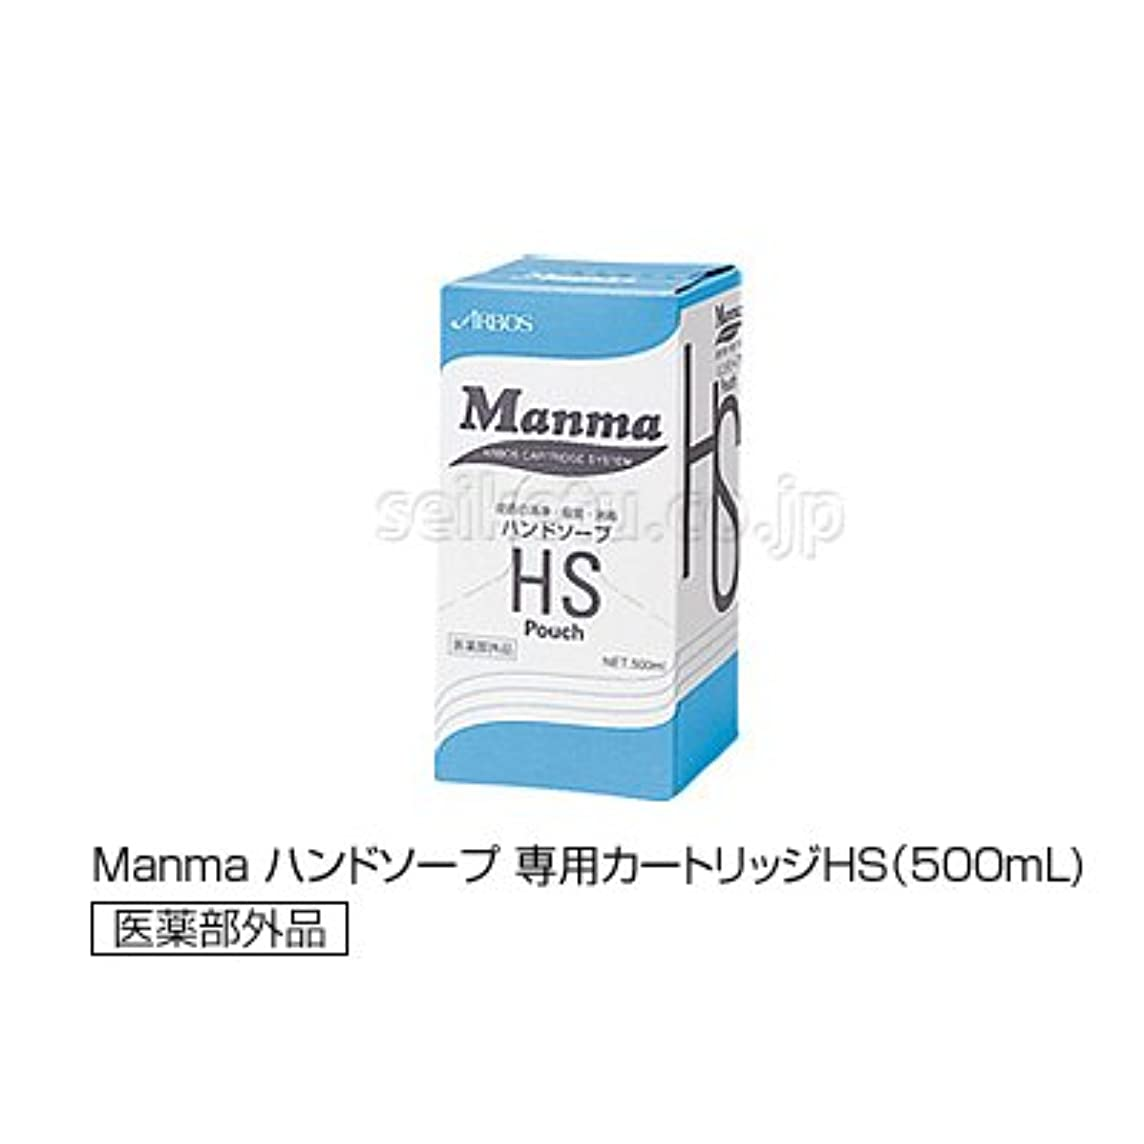 Manma ハンドソープ 専用カートリッジ/専用カートリッジHS(500mL)【清潔キレイ館】